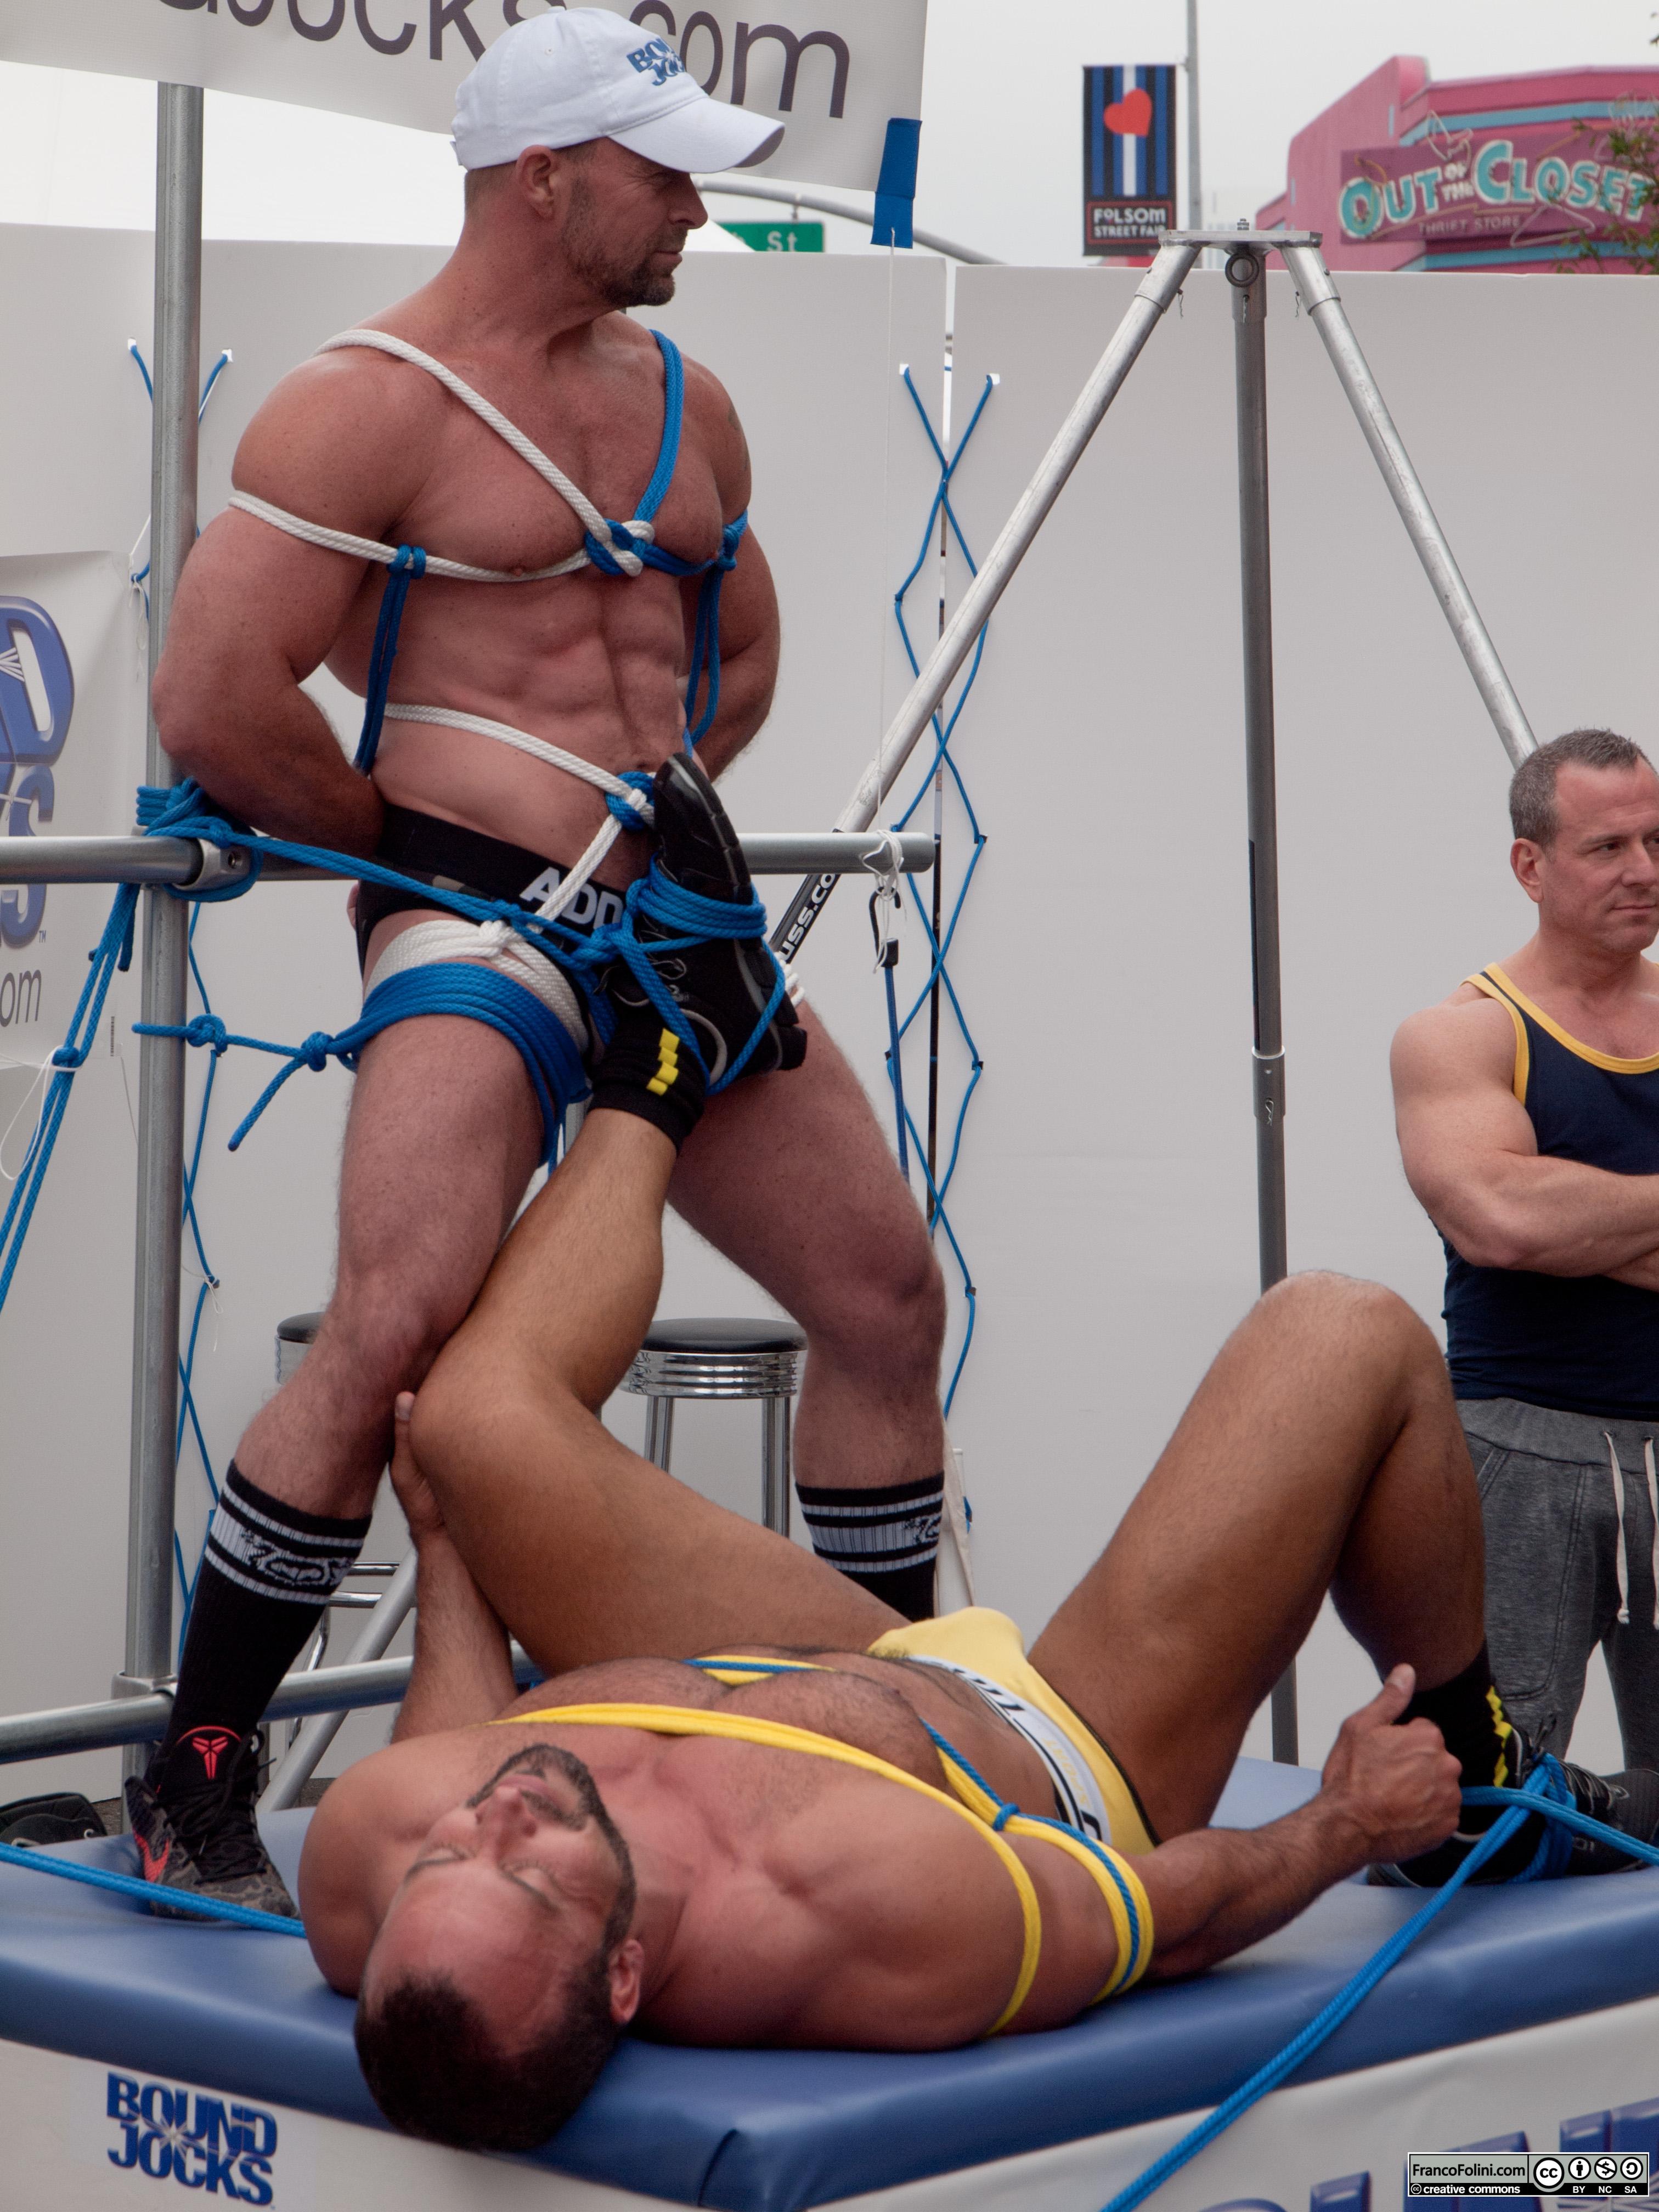 San Francisco Folsom Street Fair: ritual macho fight